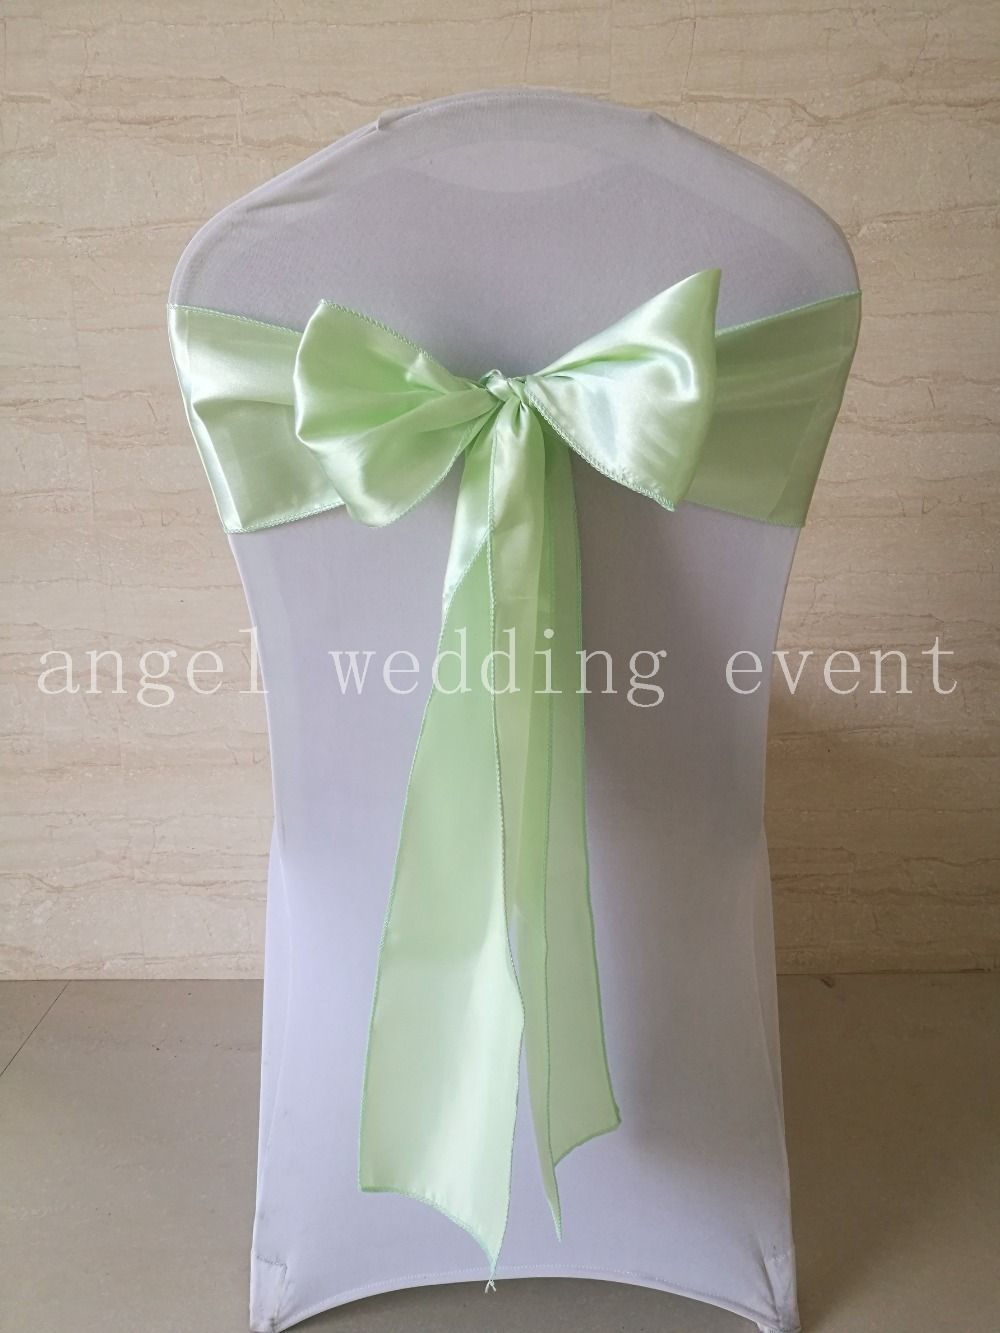 Wholesale 100pcs Light Green Baby Green Satin Chair Sashes Bows Ribbon 15cmx275cm Wedding Hot Free Shipping Chair Sashes Green Satin Sash